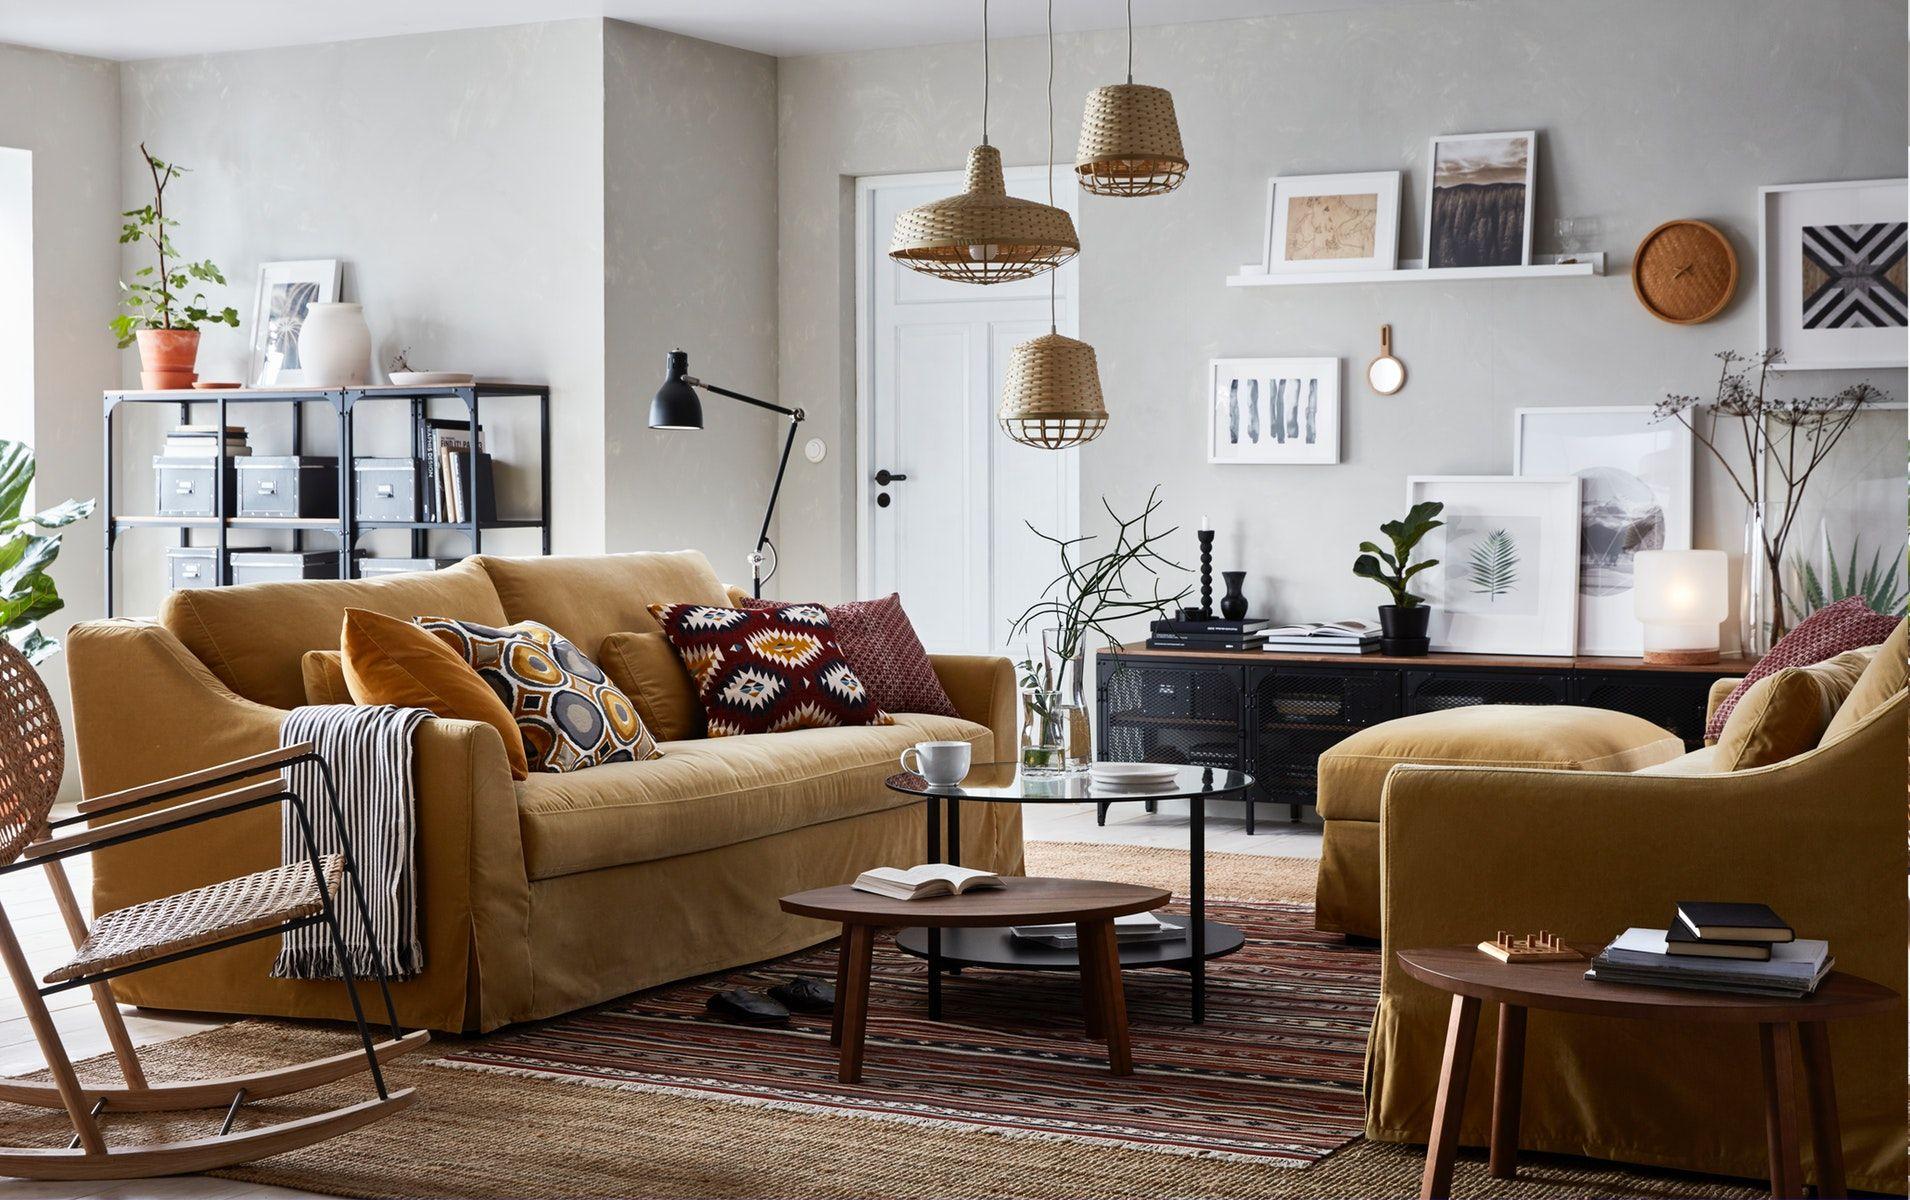 Ikea Living Room Photos fÄrlÖv 3-seat sofa - djuparp yellow-beige - ikea switzerland